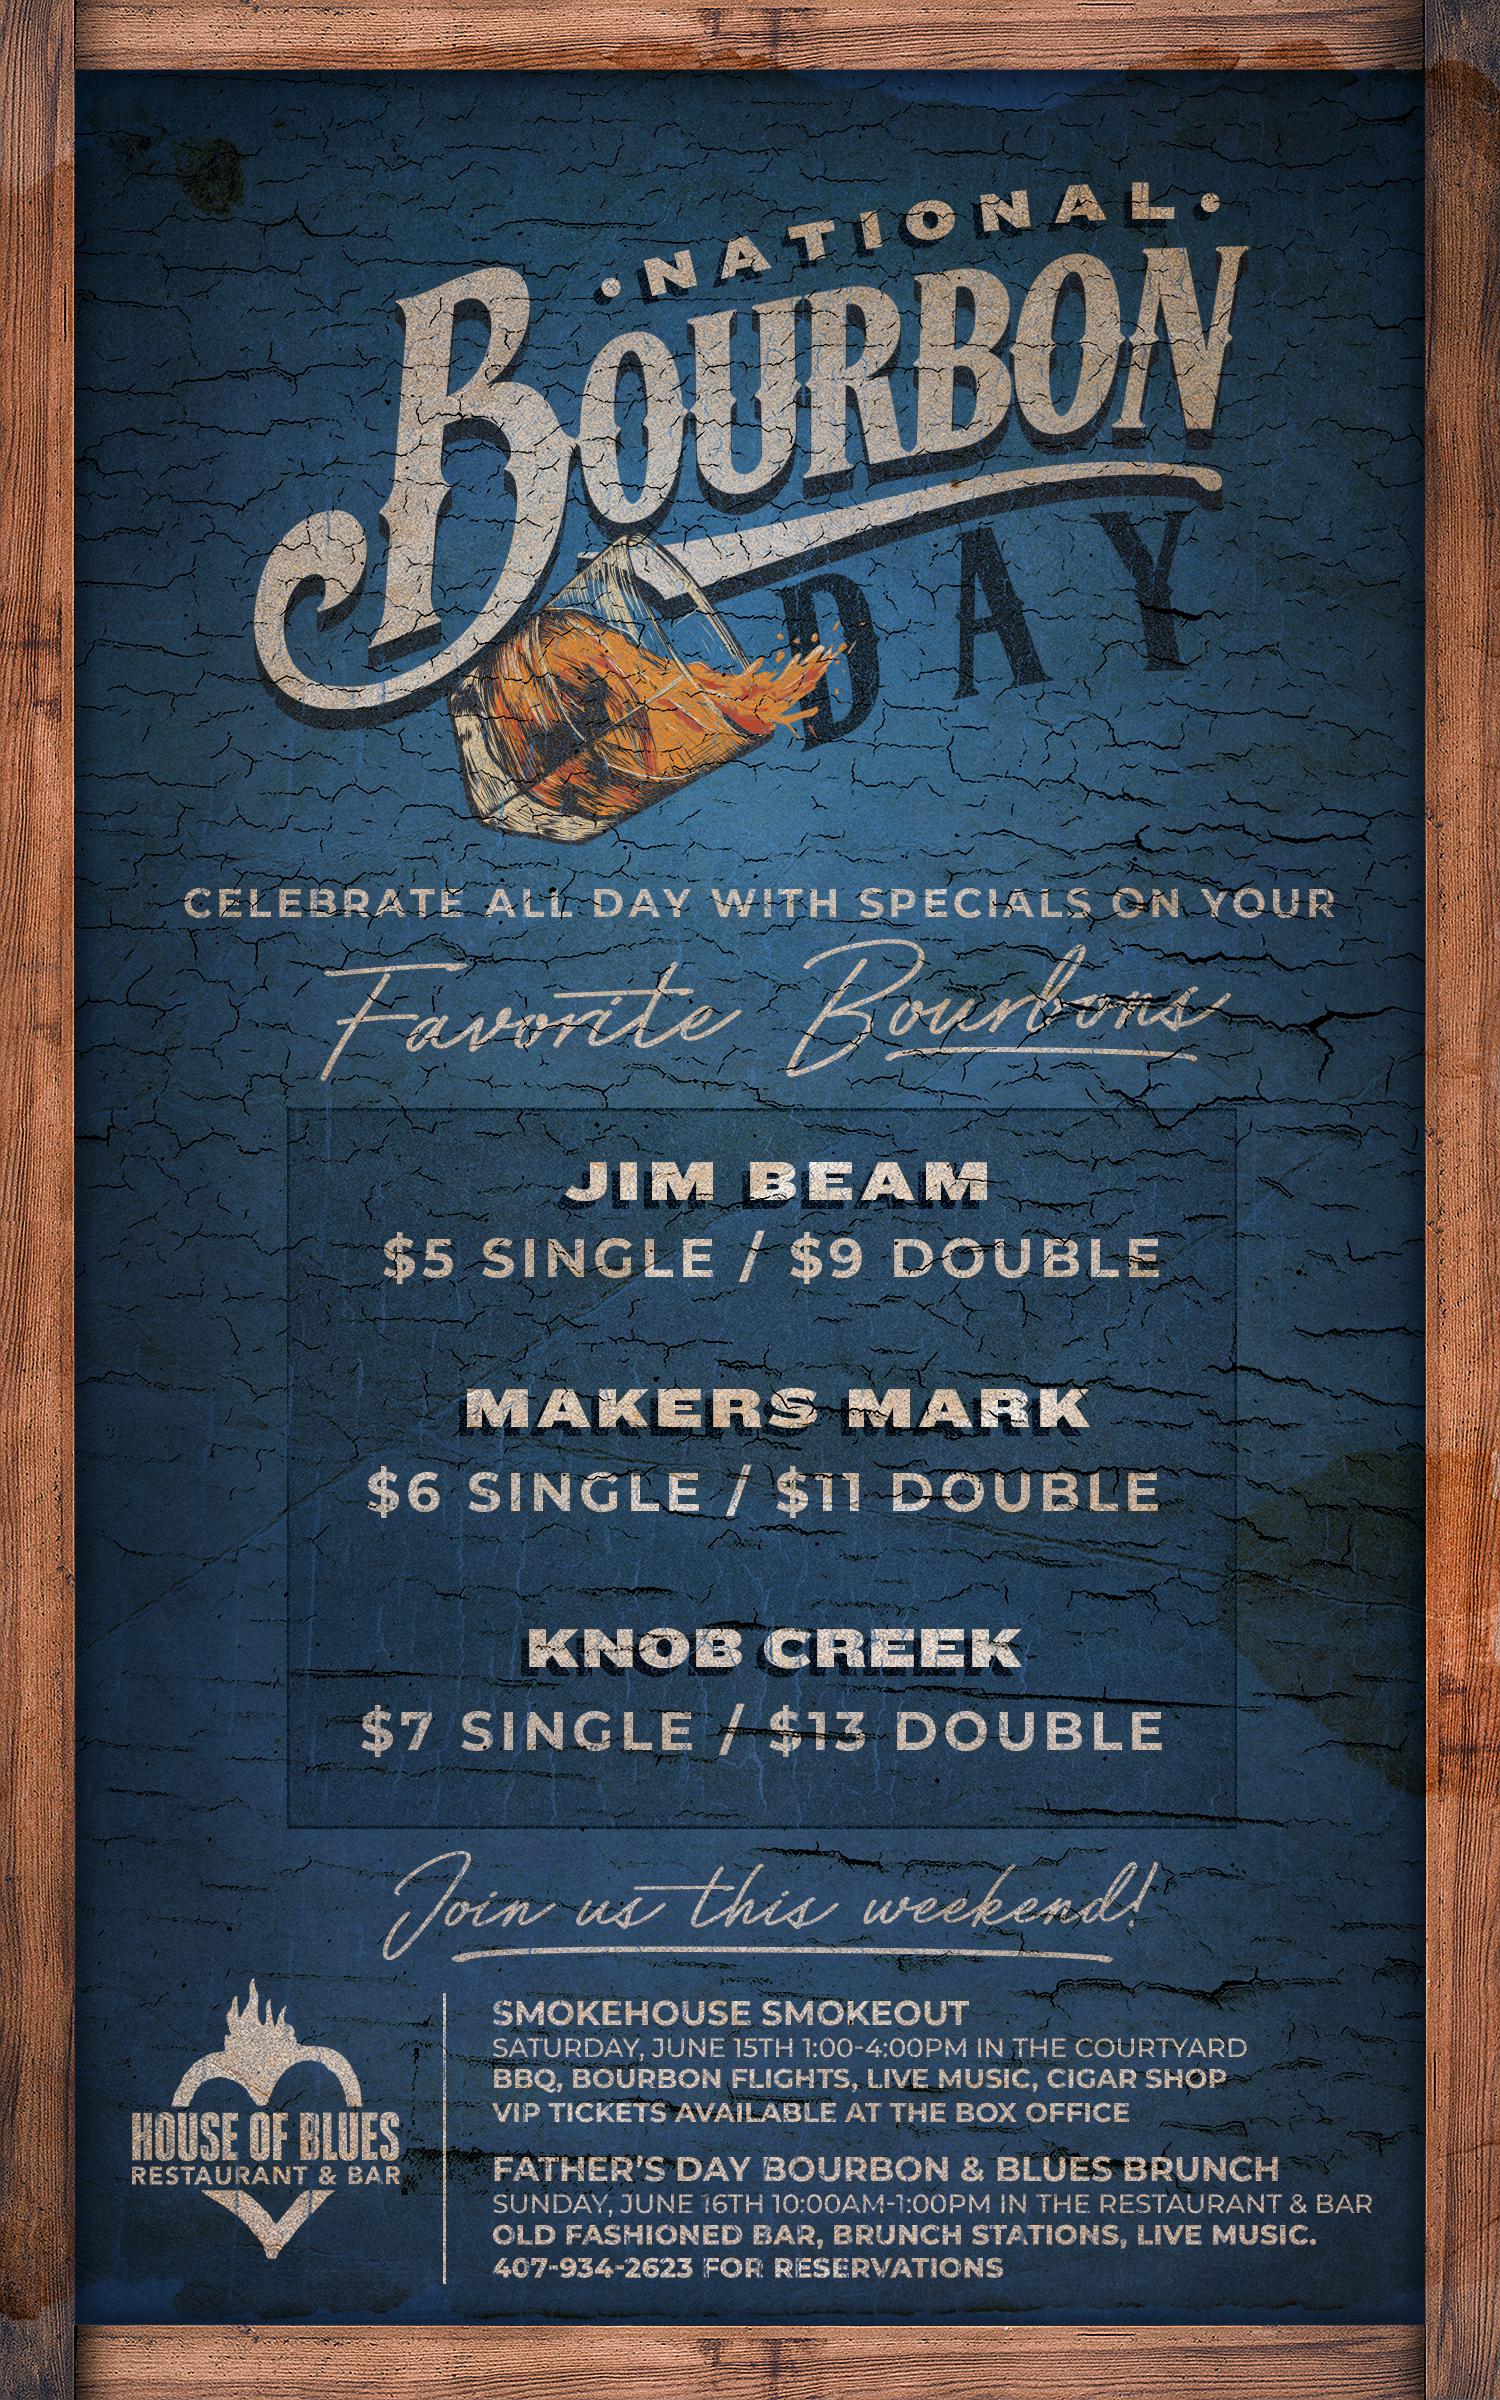 National Bourbon Day Menu June 14th 2019